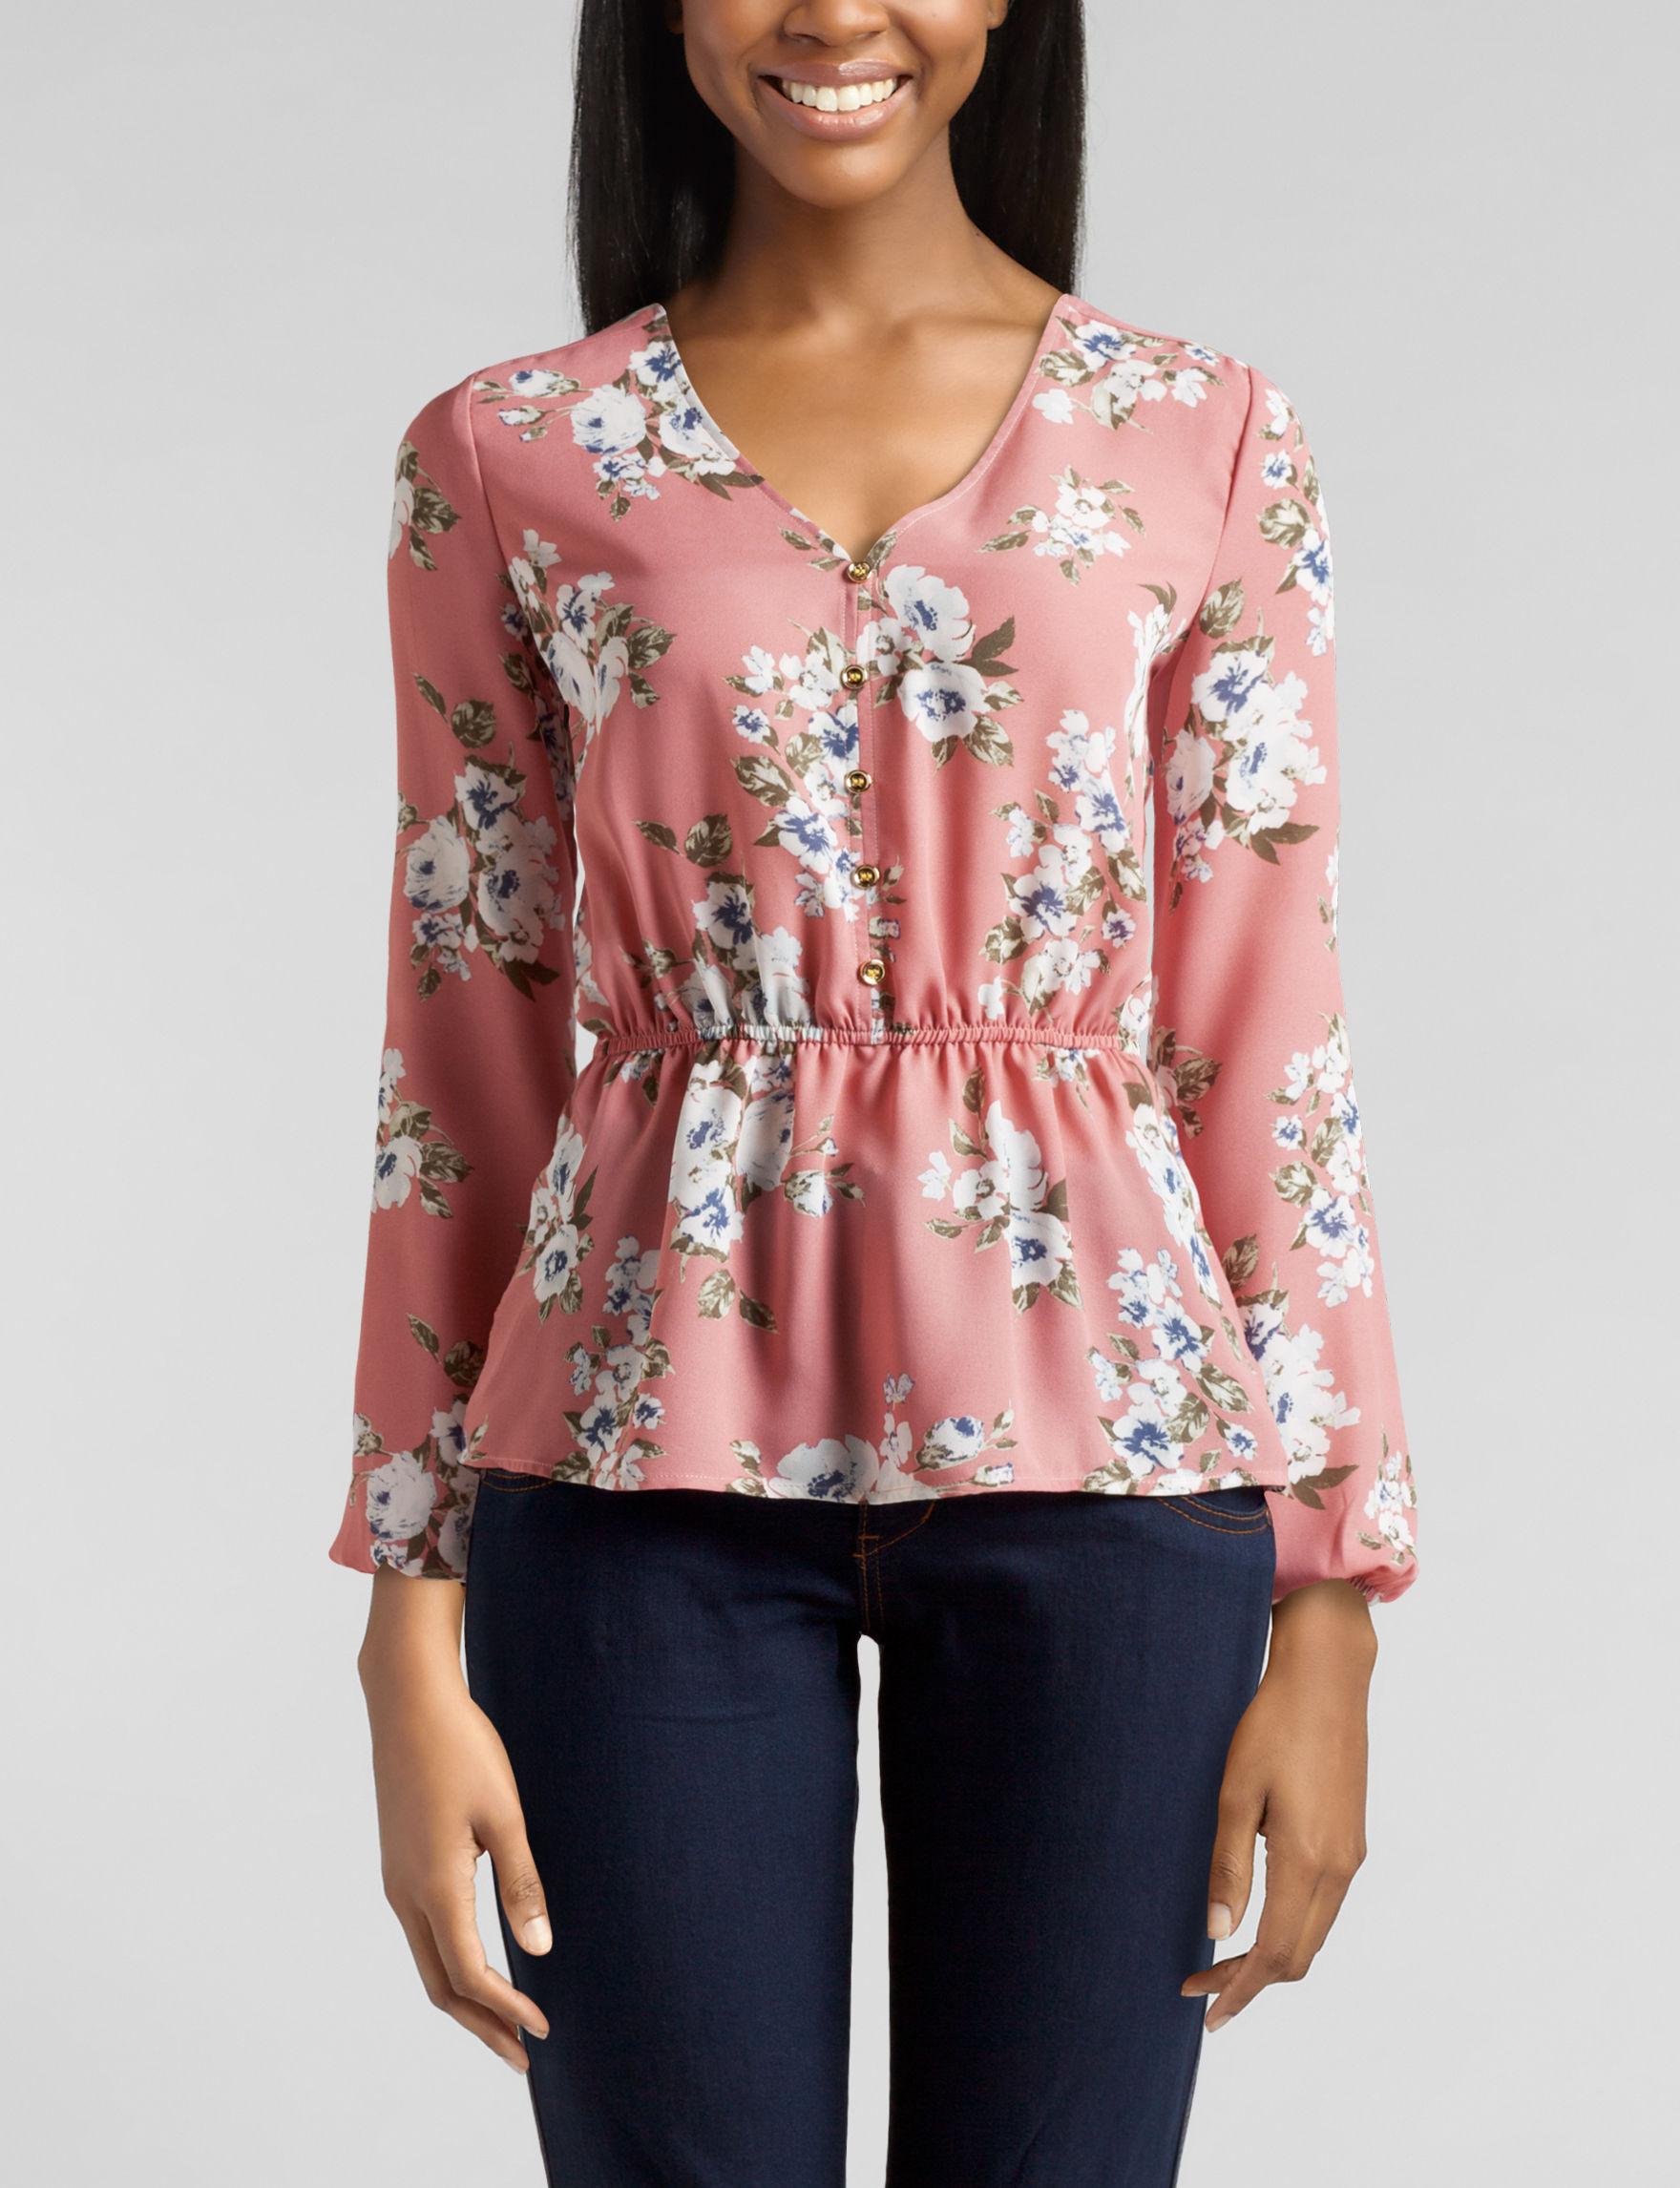 Wishful Park Rose Shirts & Blouses